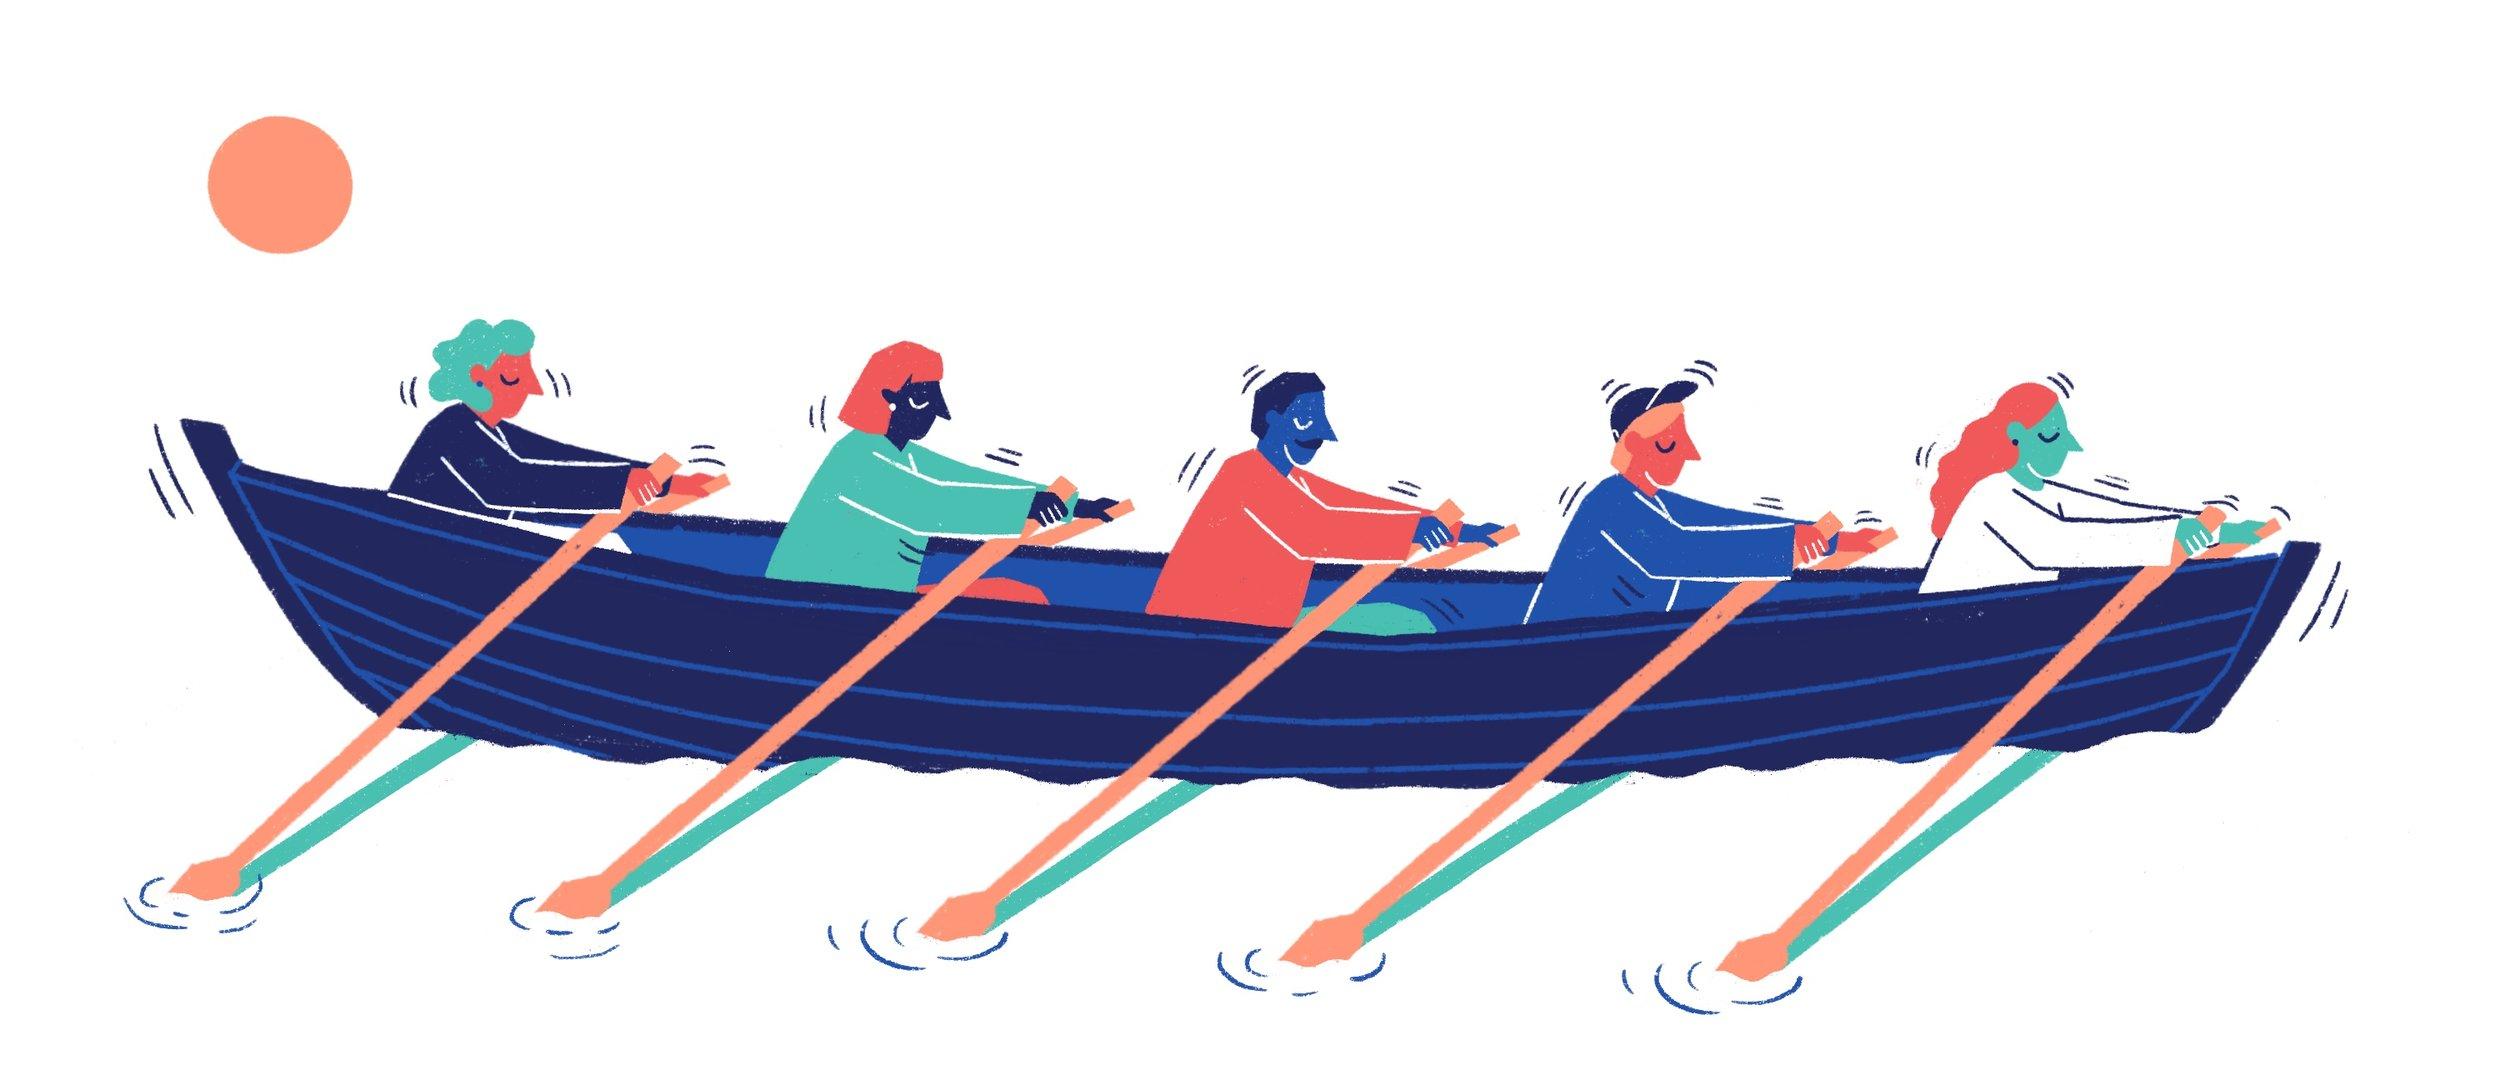 IDEO-team-rowboat.jpg